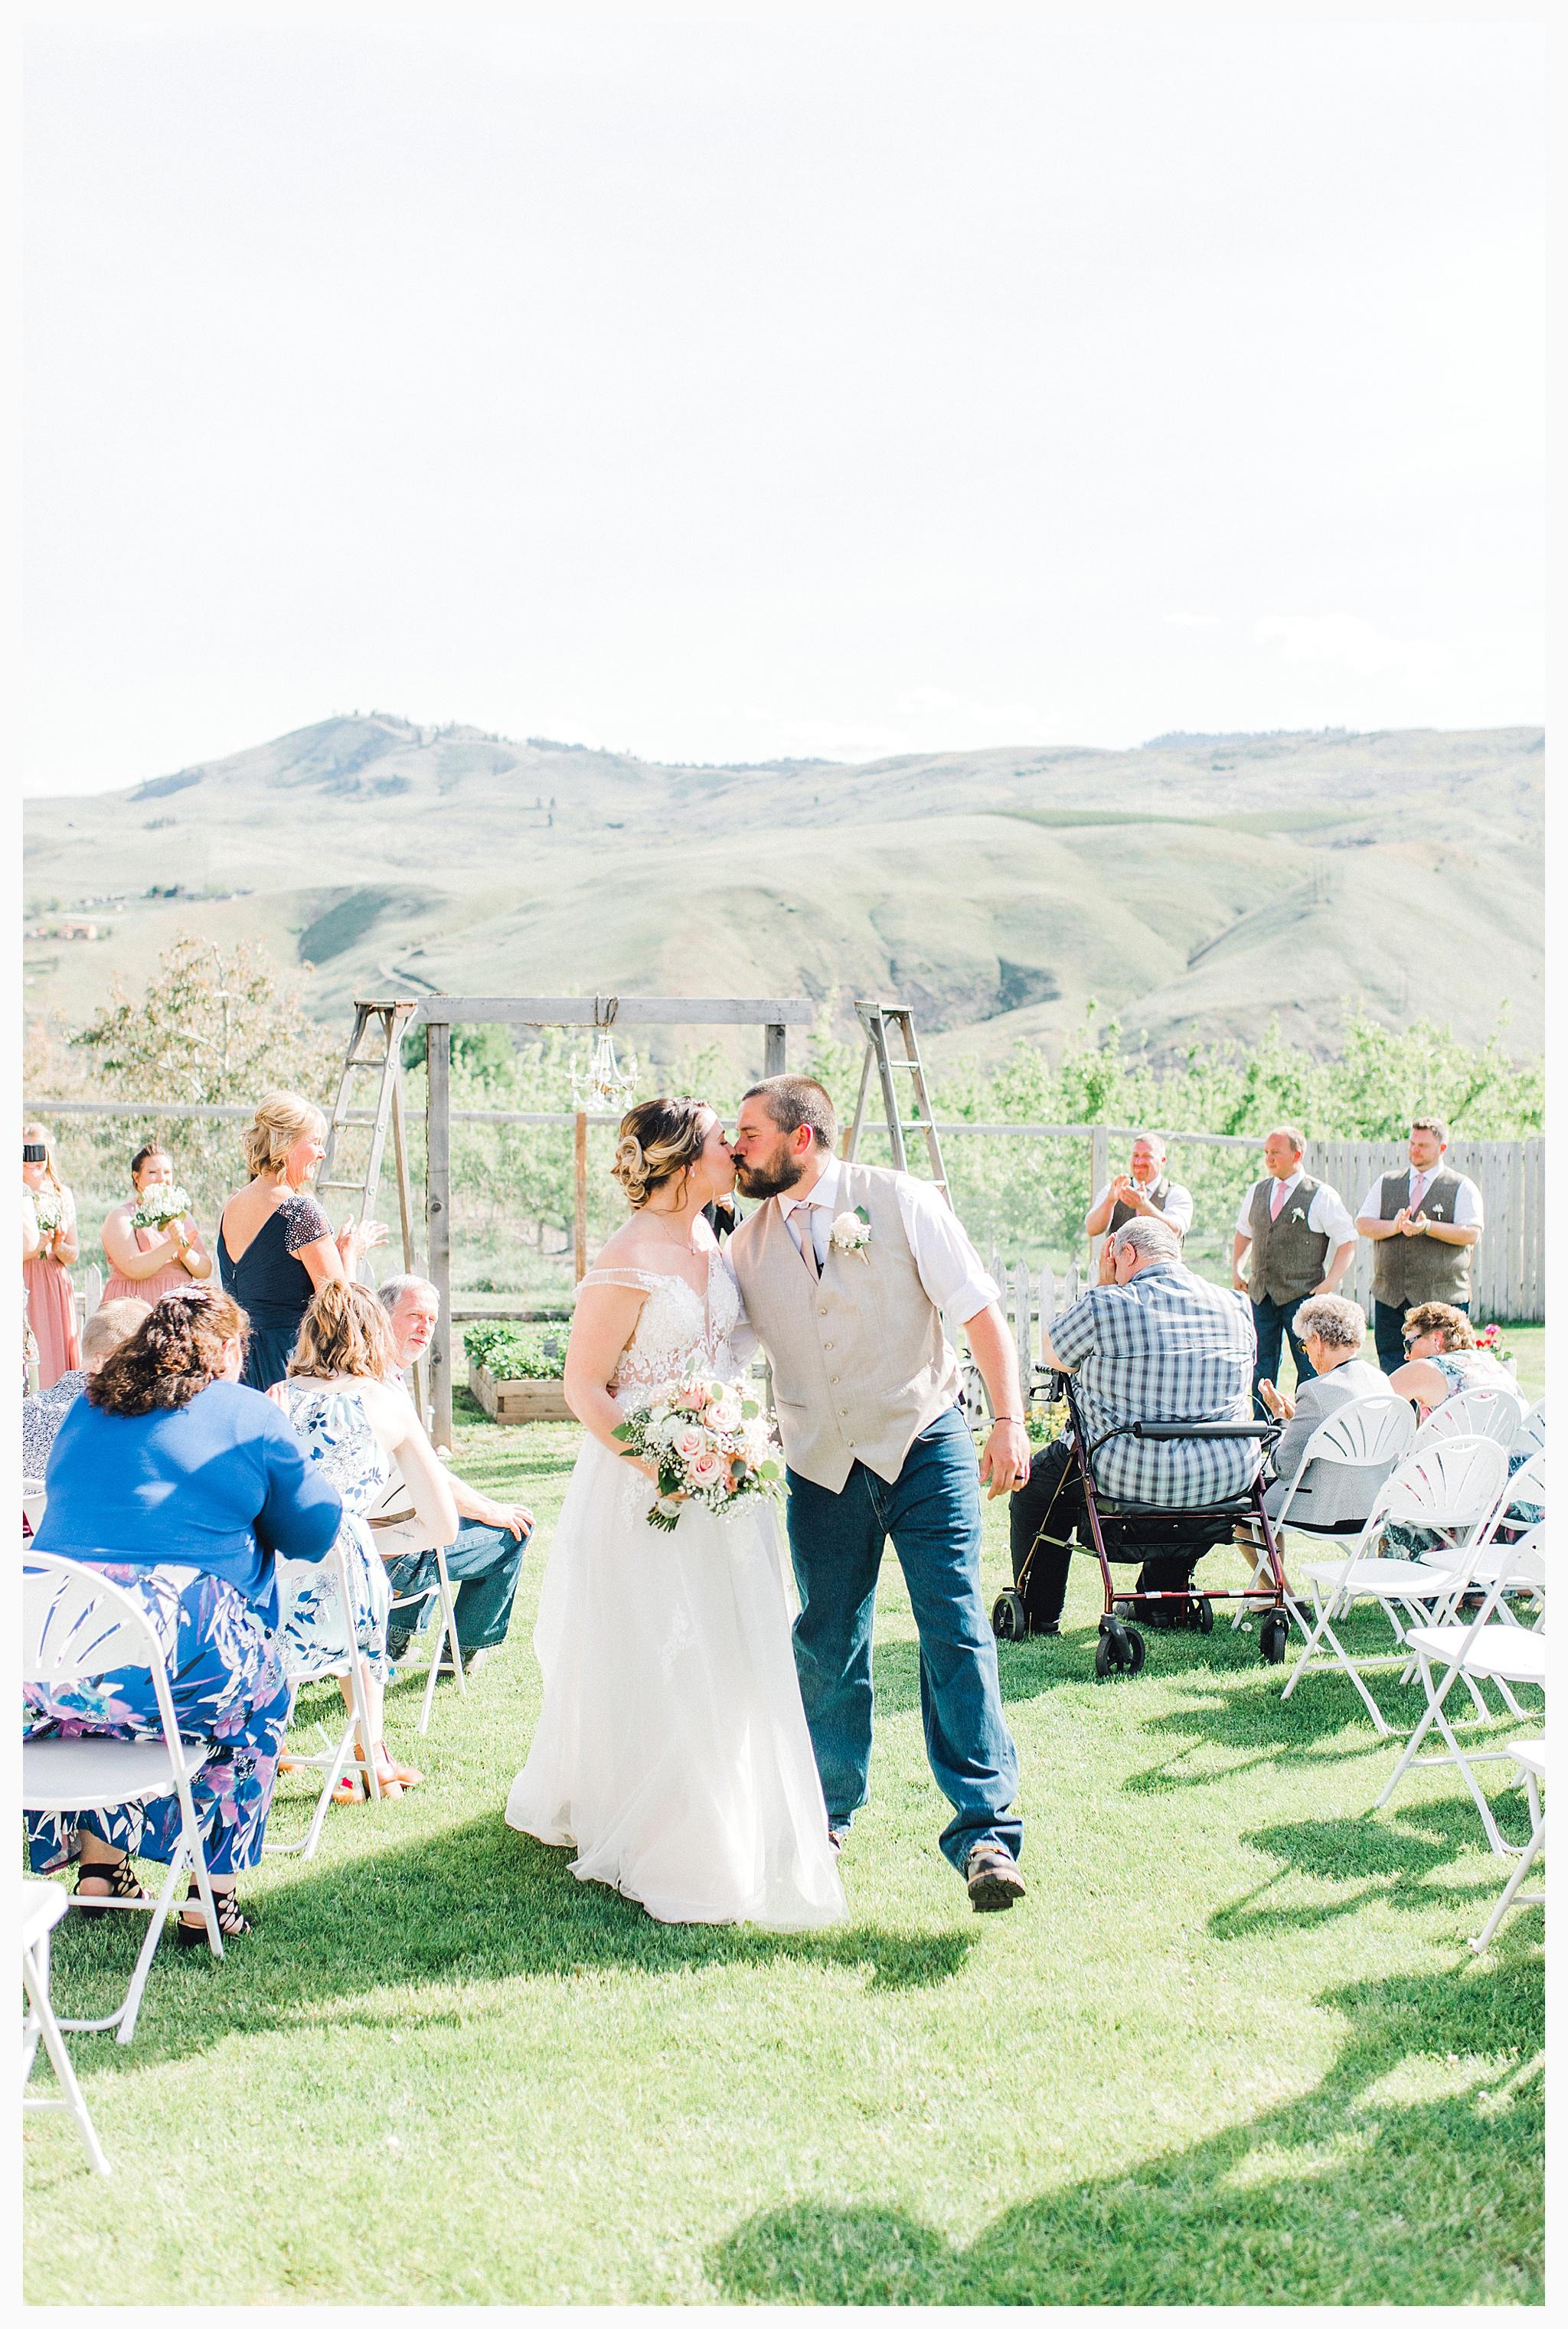 Rustic barn wedding in Wenatchee Washington at Sunshine Ranch on Easy Street, Emma Rose Company Seattle PNW Light and Airy Wedding Photographer_0065.jpg